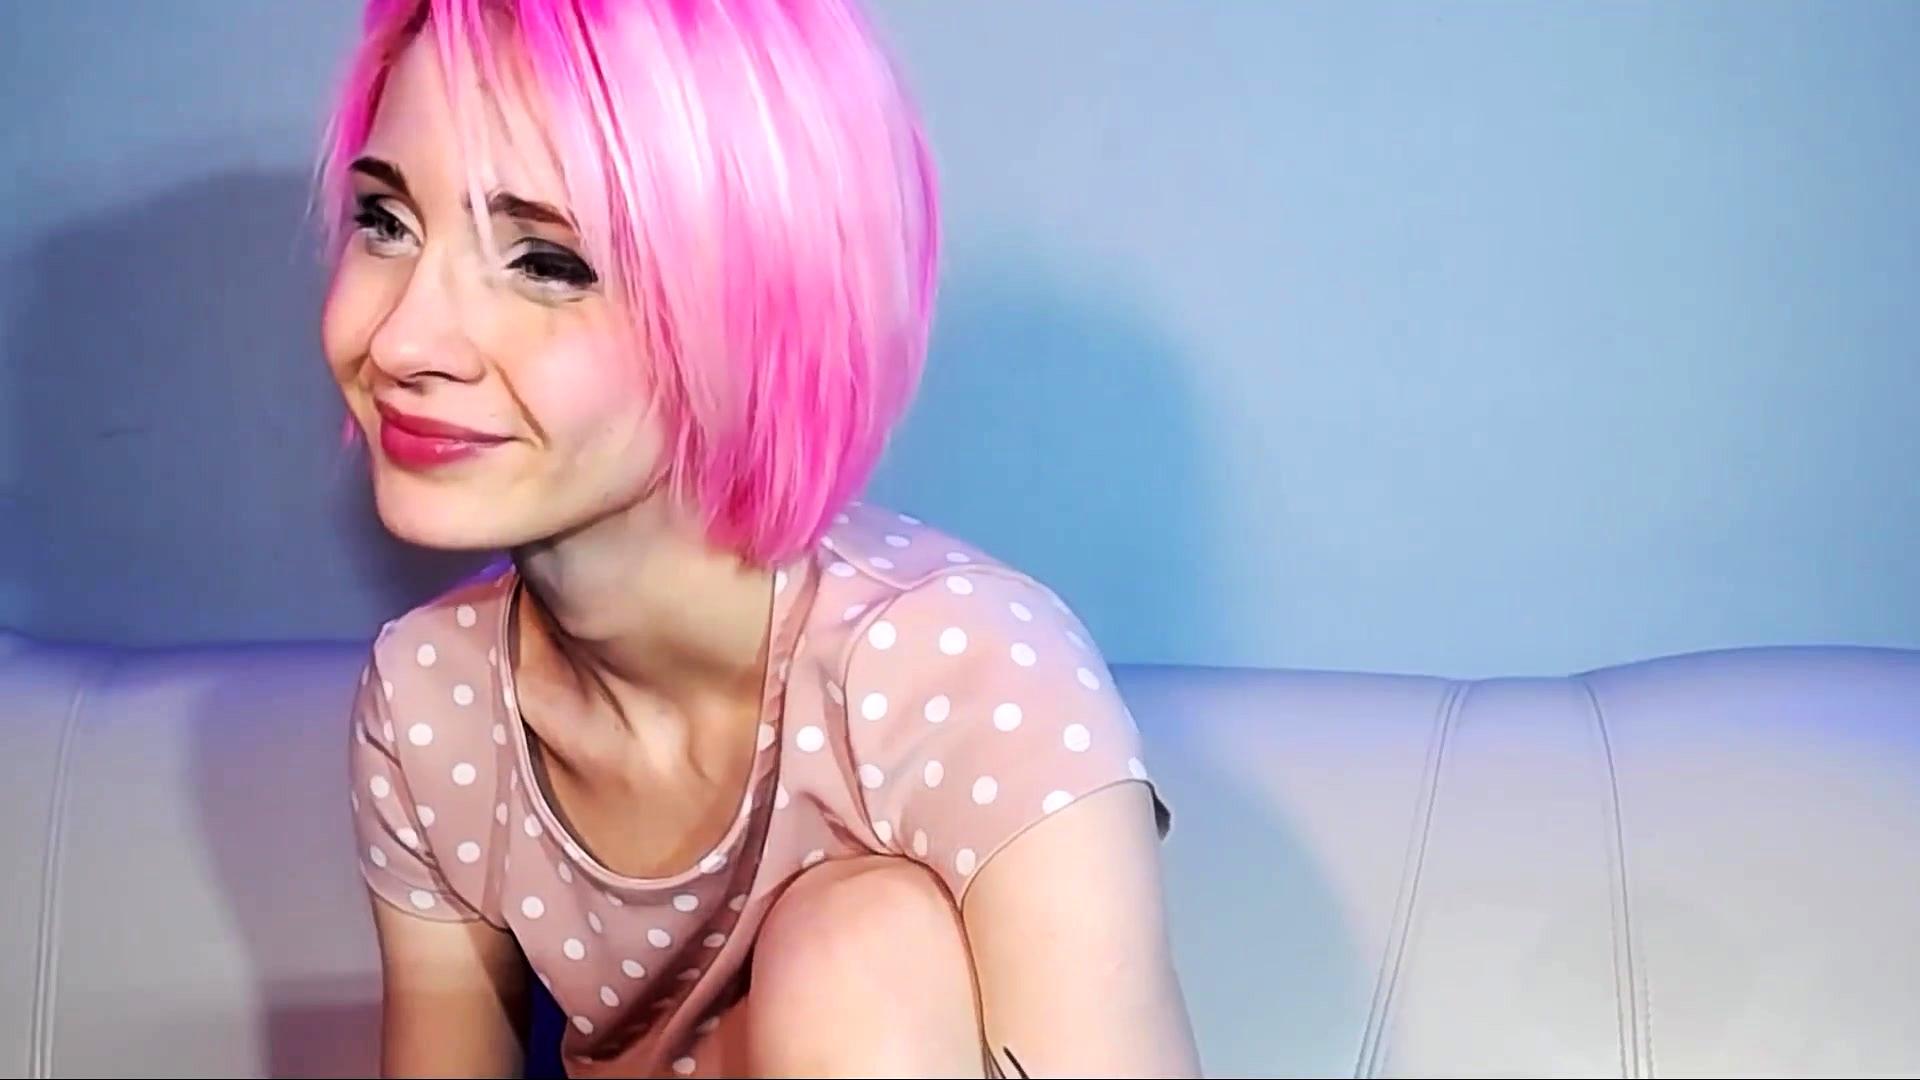 Hottest Solo Teen Webcam Show Free Hottest Webcam Porn Video